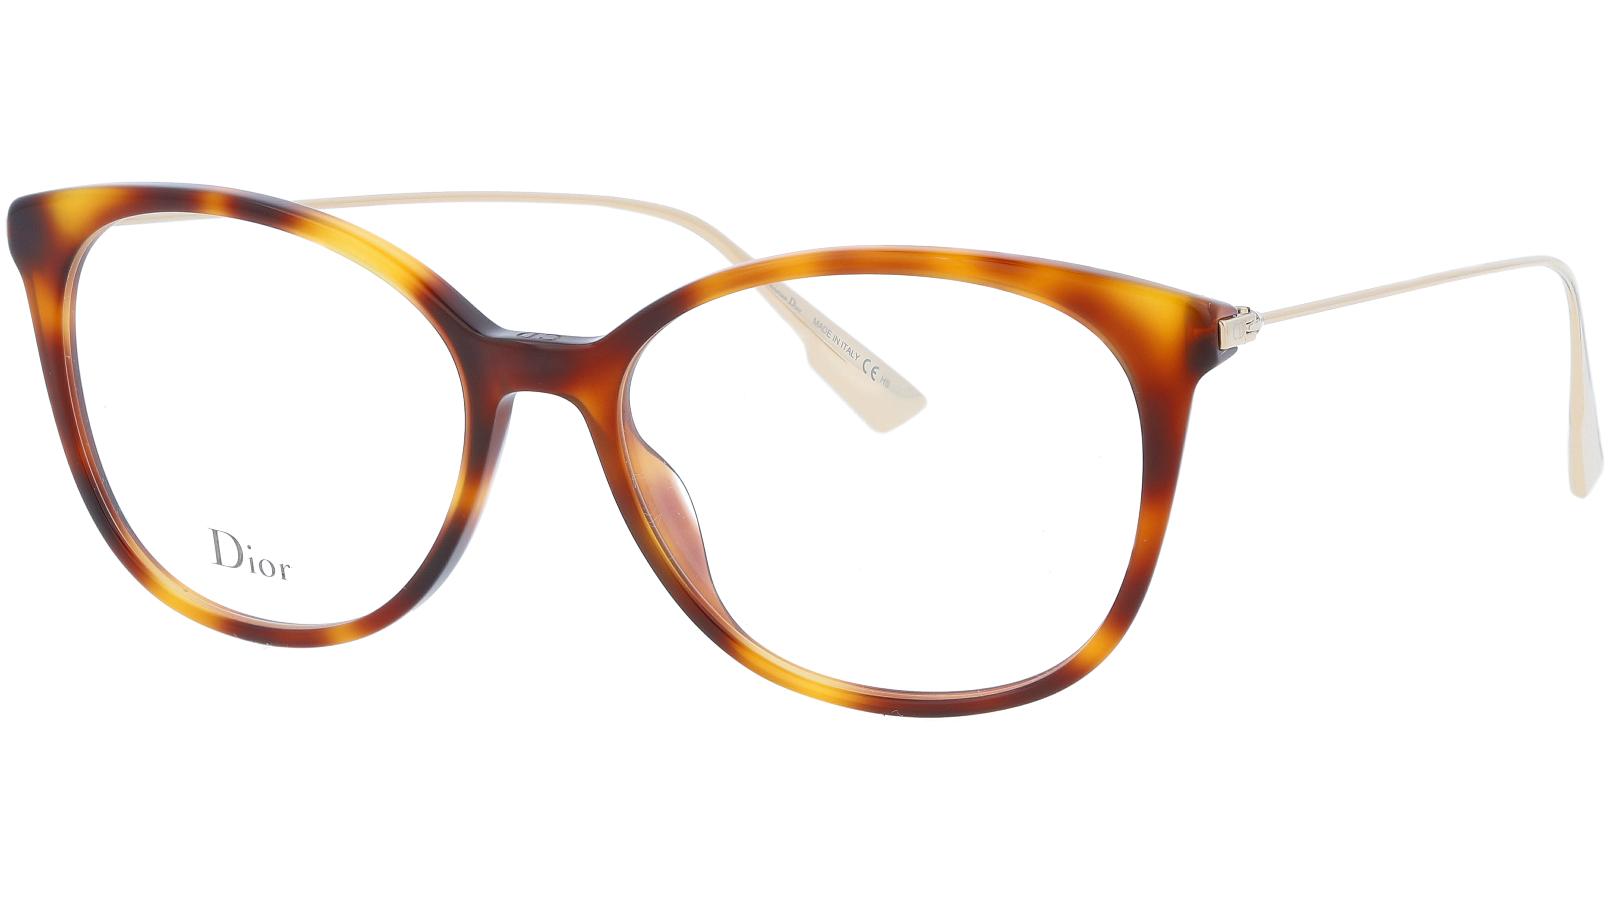 Dior SIGHTO1 086 52 Dark Glasses